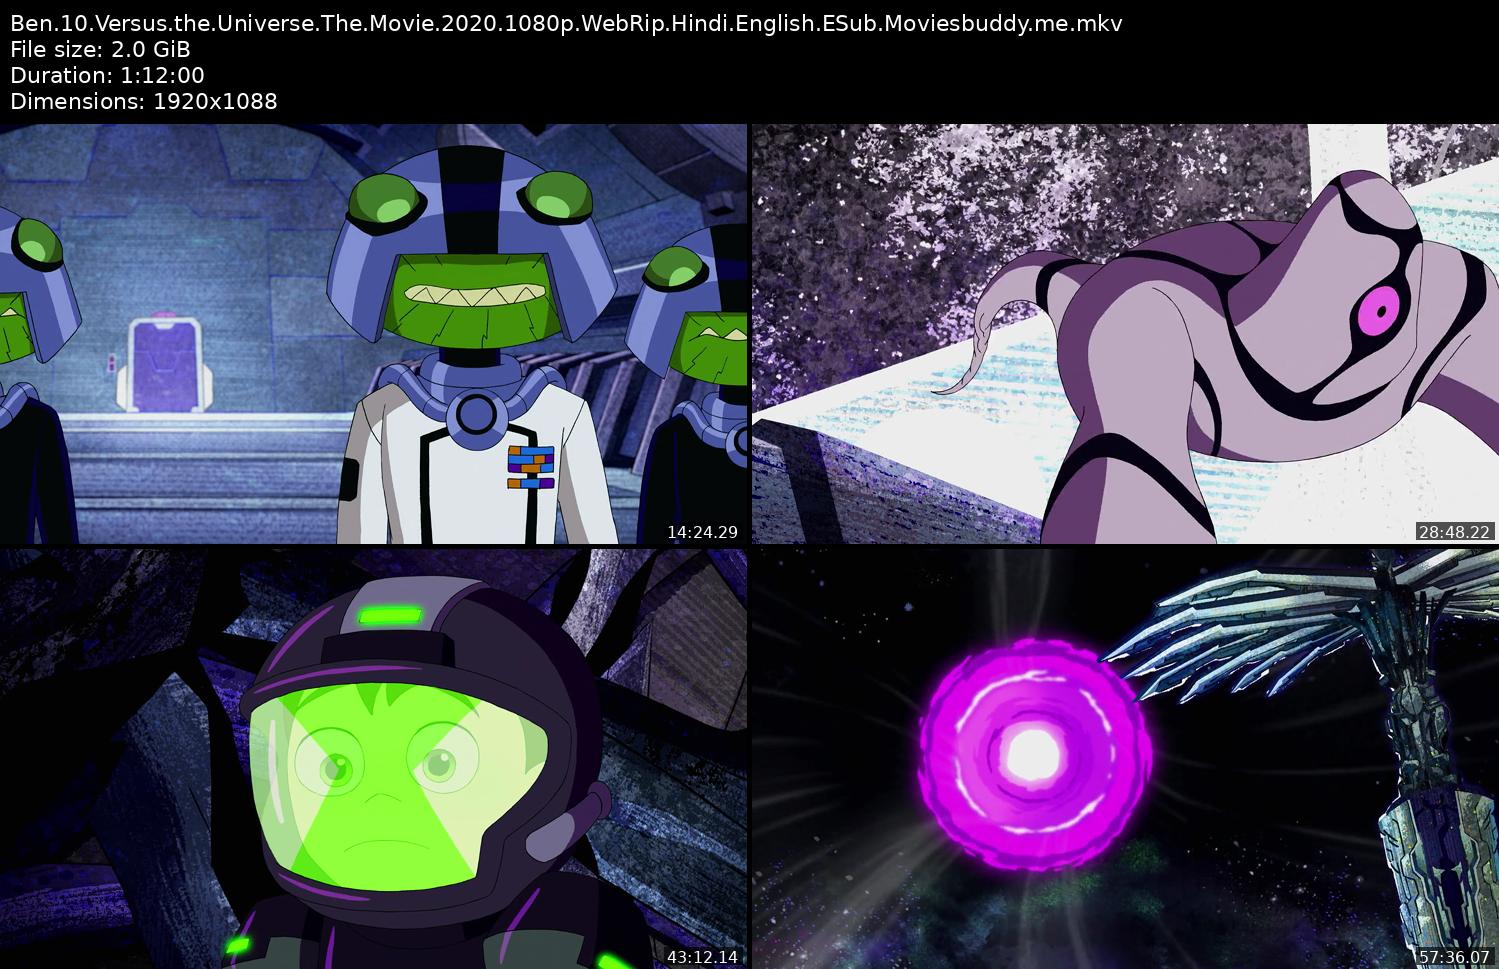 ScreenShots of Ben 10 vs. the Universe: The Movie